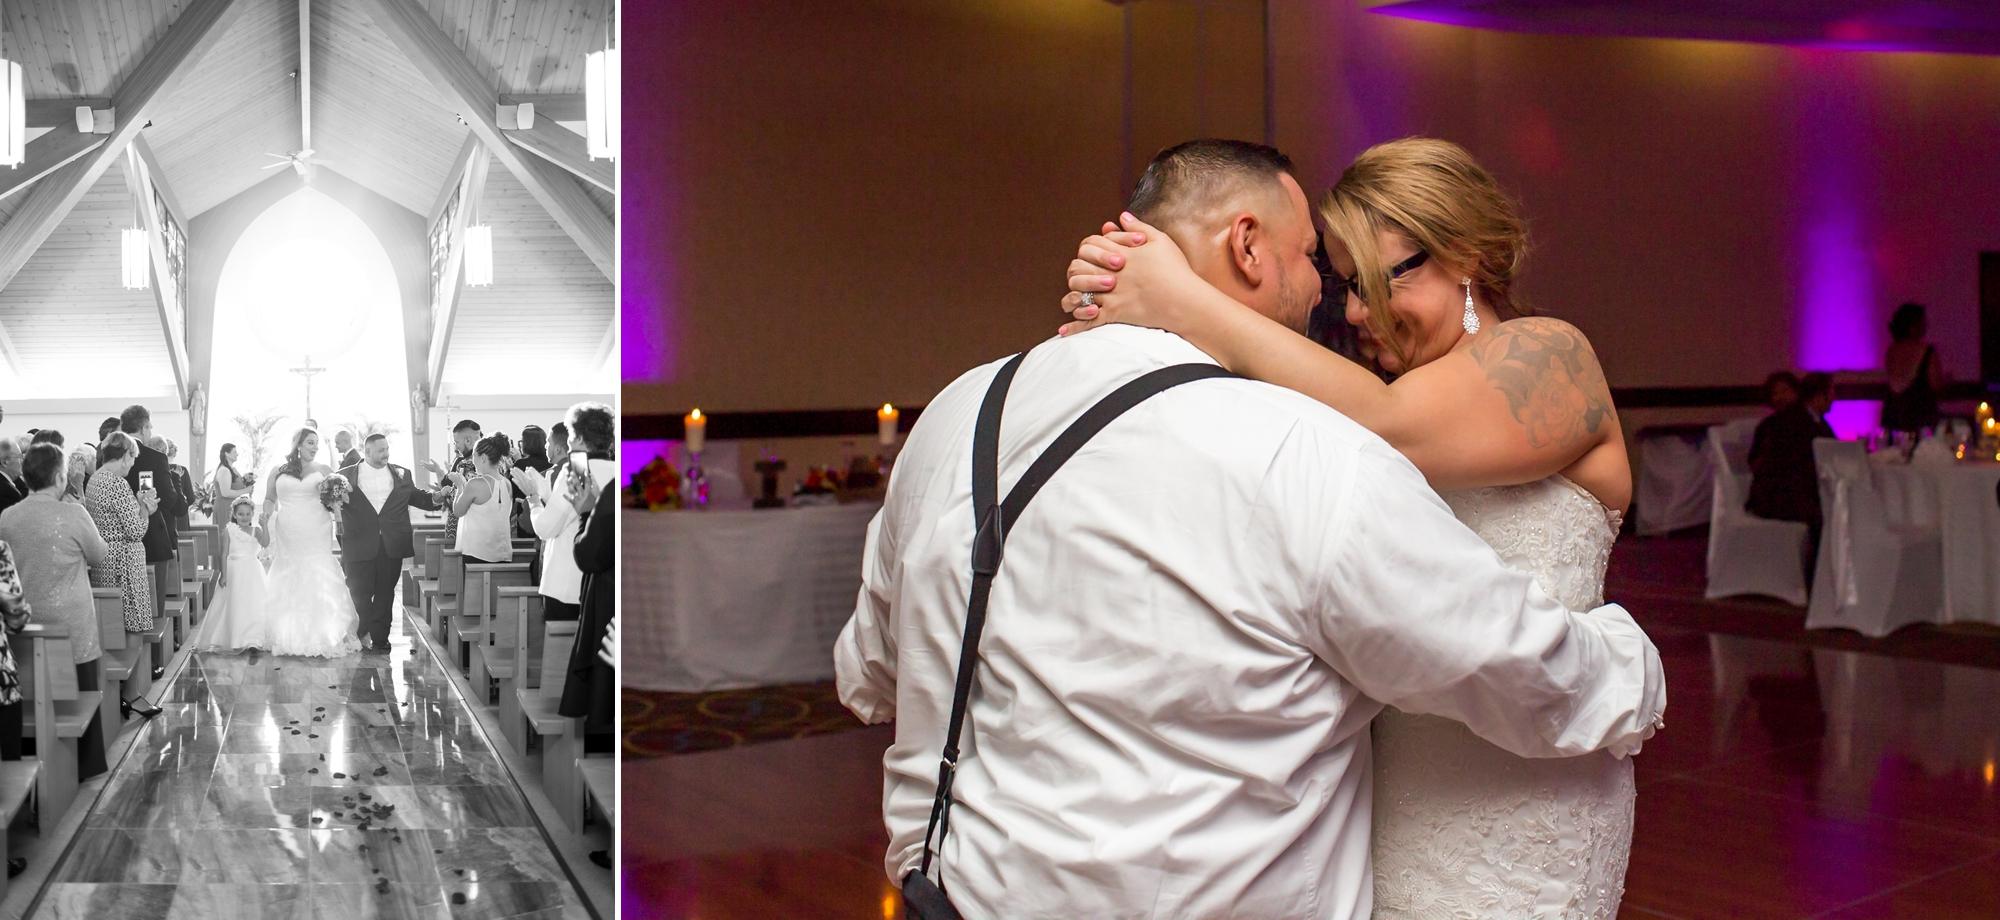 Best of 2016 | Stamford, CT Wedding at Sheraton Stamford Hotel | CT, NYC, New England + Destination Luxury Wedding + Engagement Photographer | Shaina Lee Photography